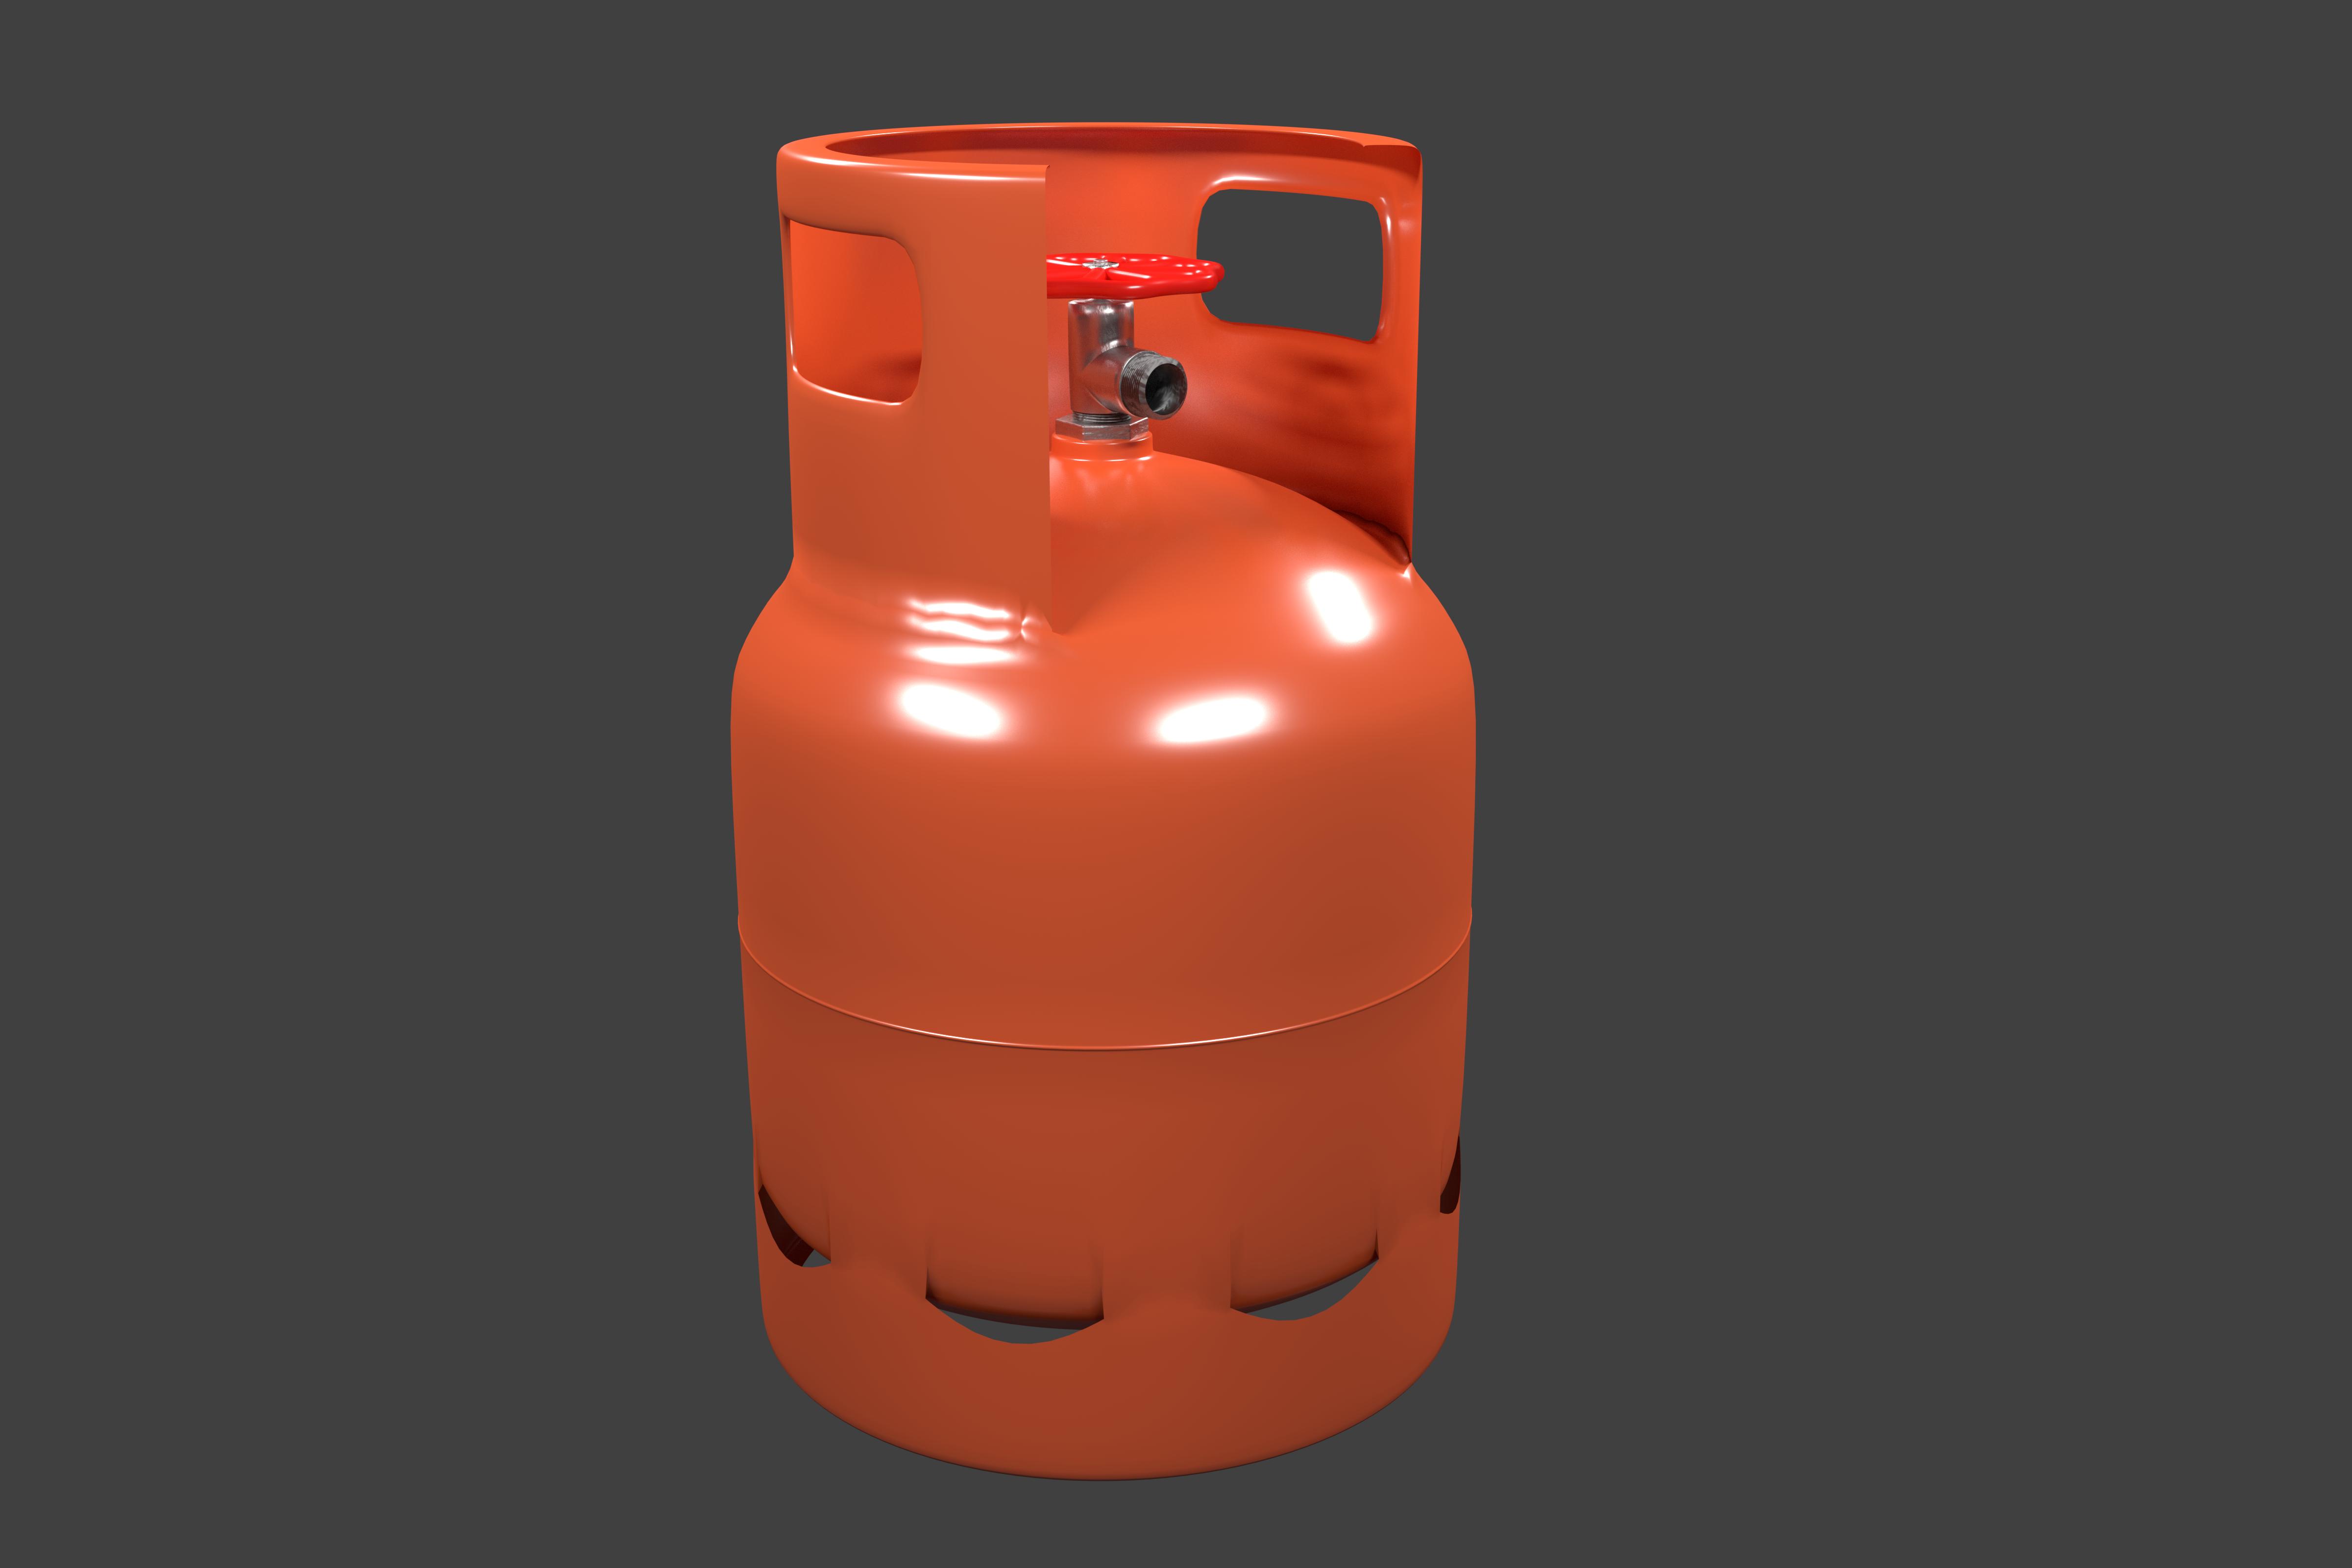 propane gas tank by paceyu 3docean. Black Bedroom Furniture Sets. Home Design Ideas